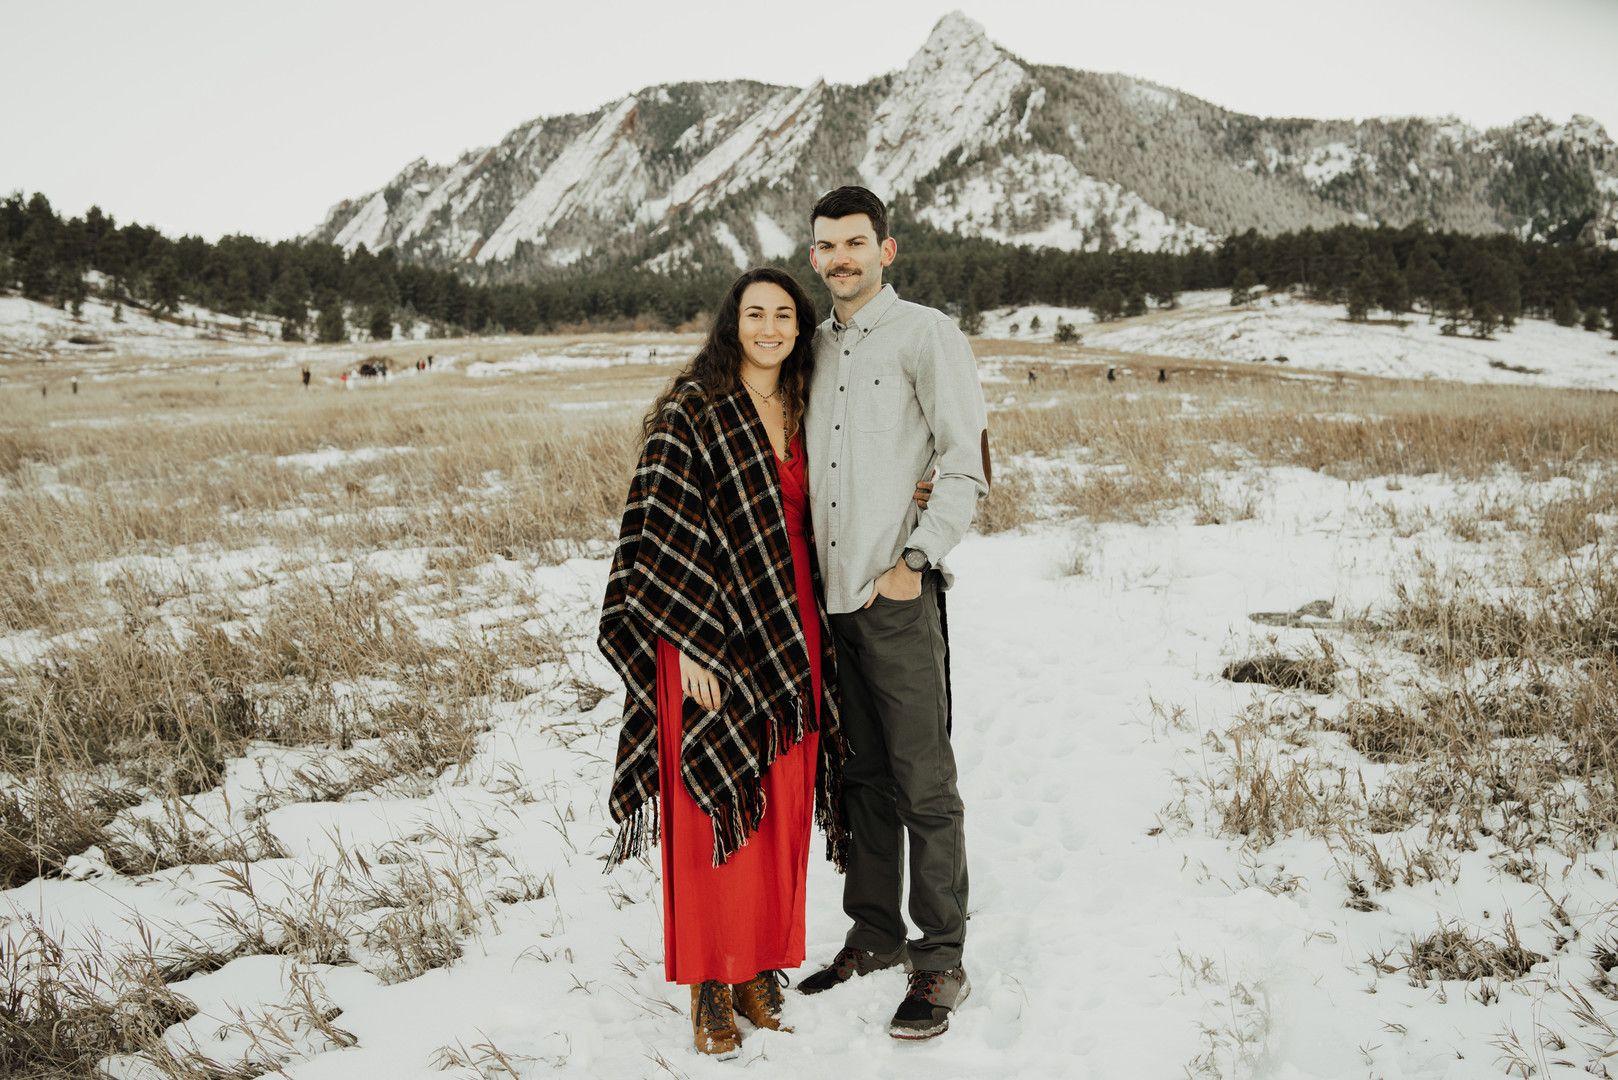 Boulder co dating dating nettsted bakside